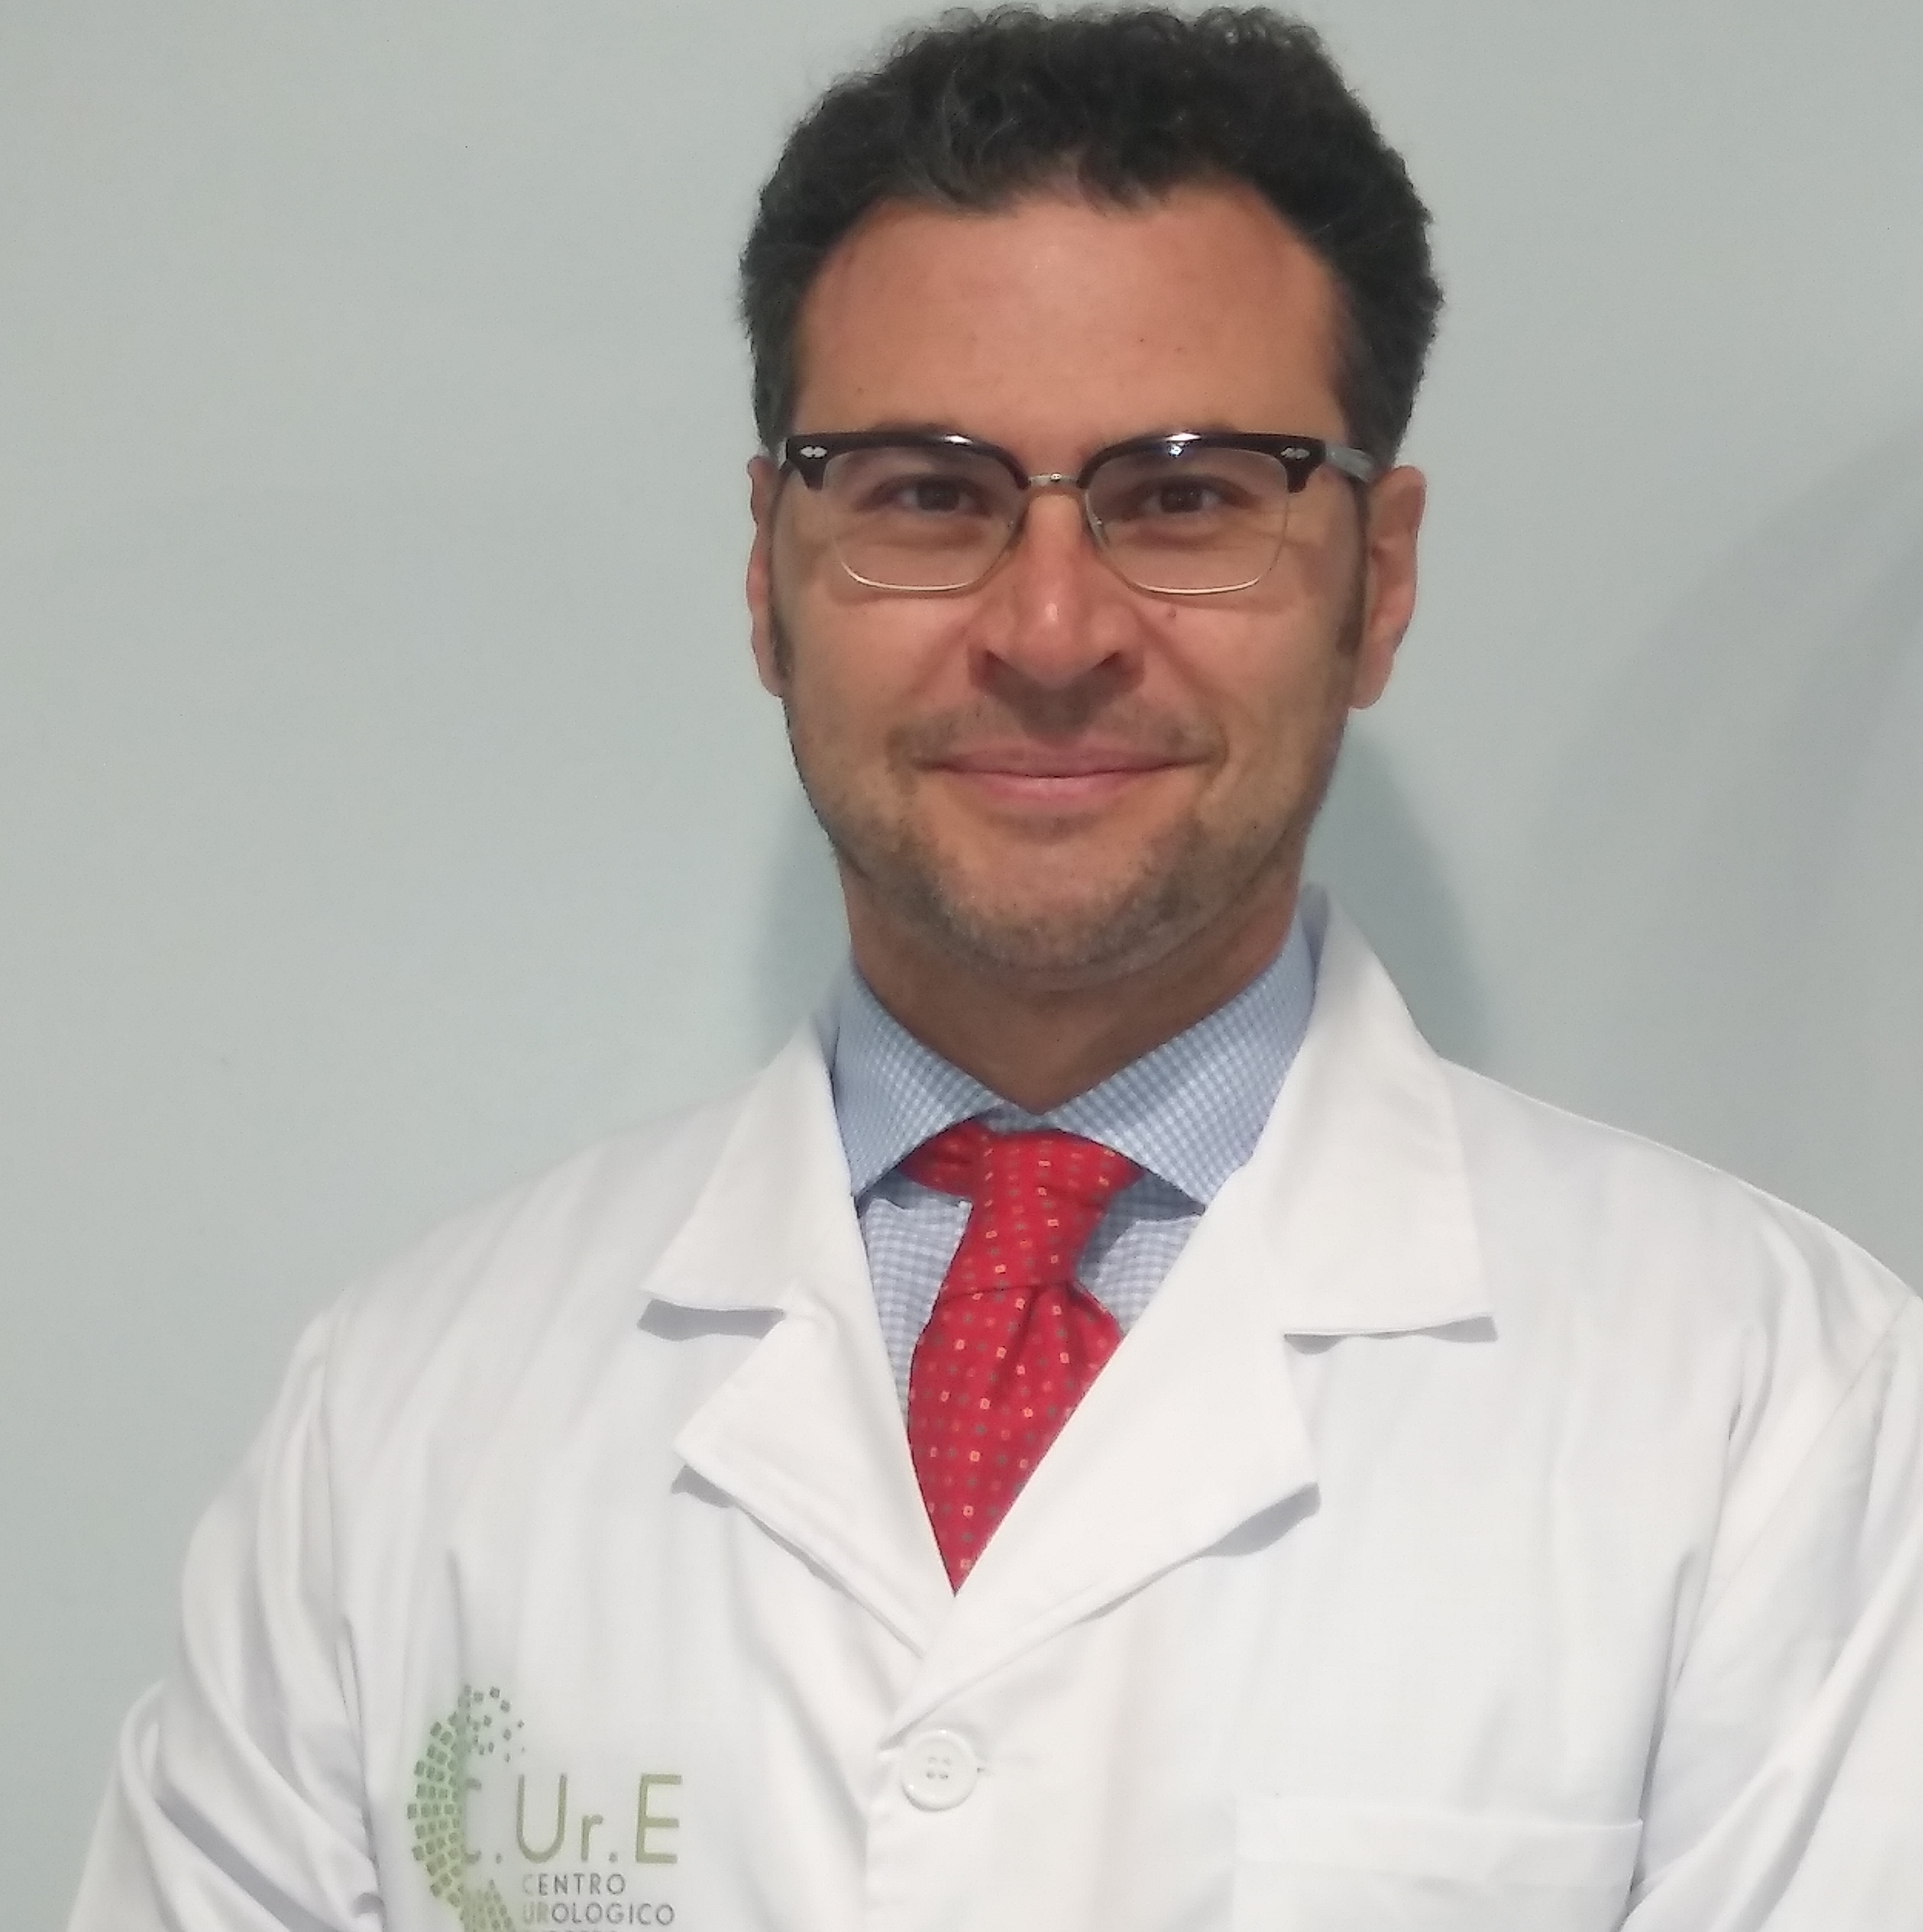 Dott. Luca Cindolo